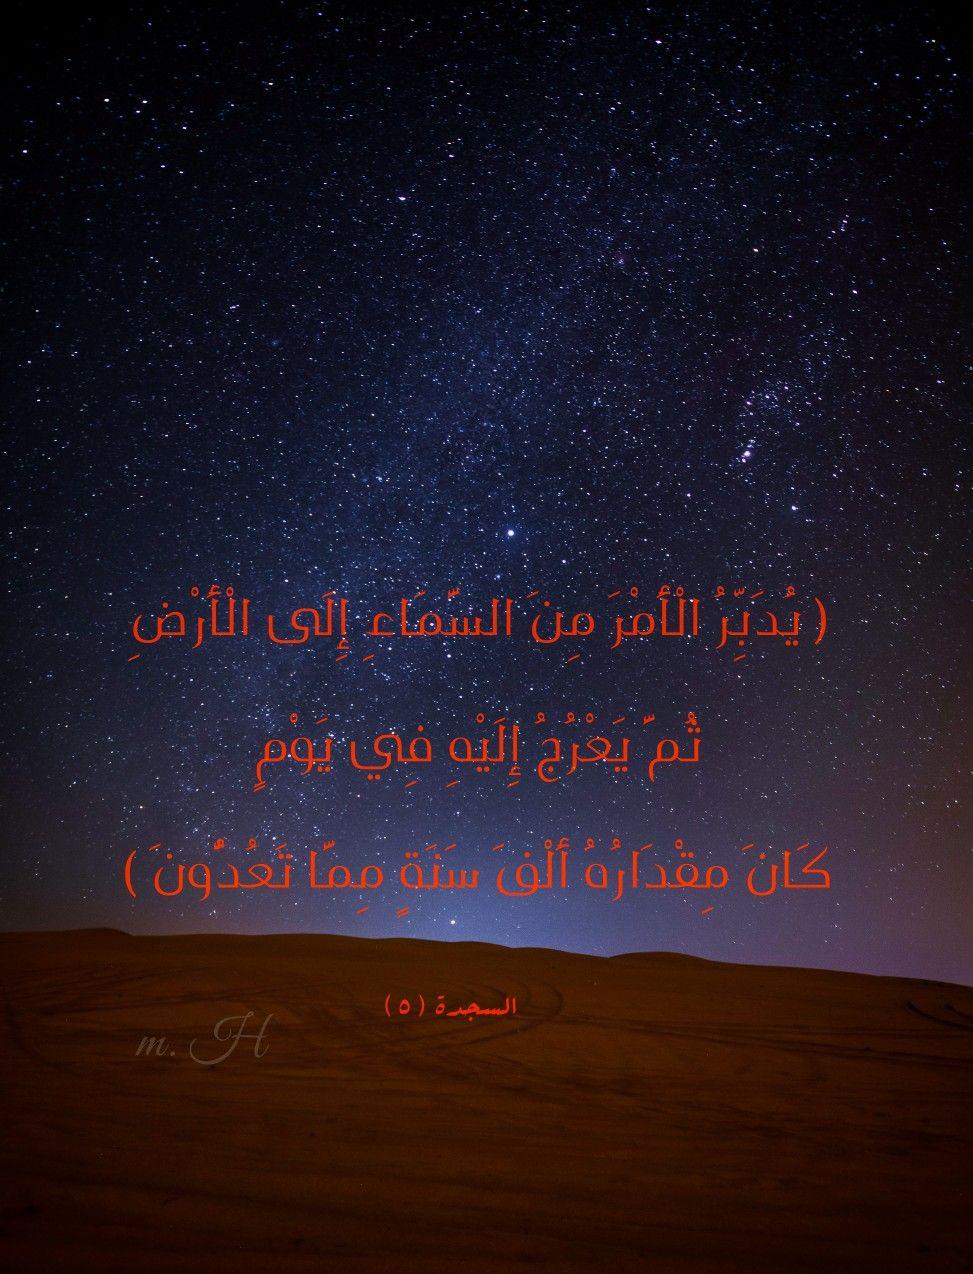 Quran Verse Quran Verses Verse Poster